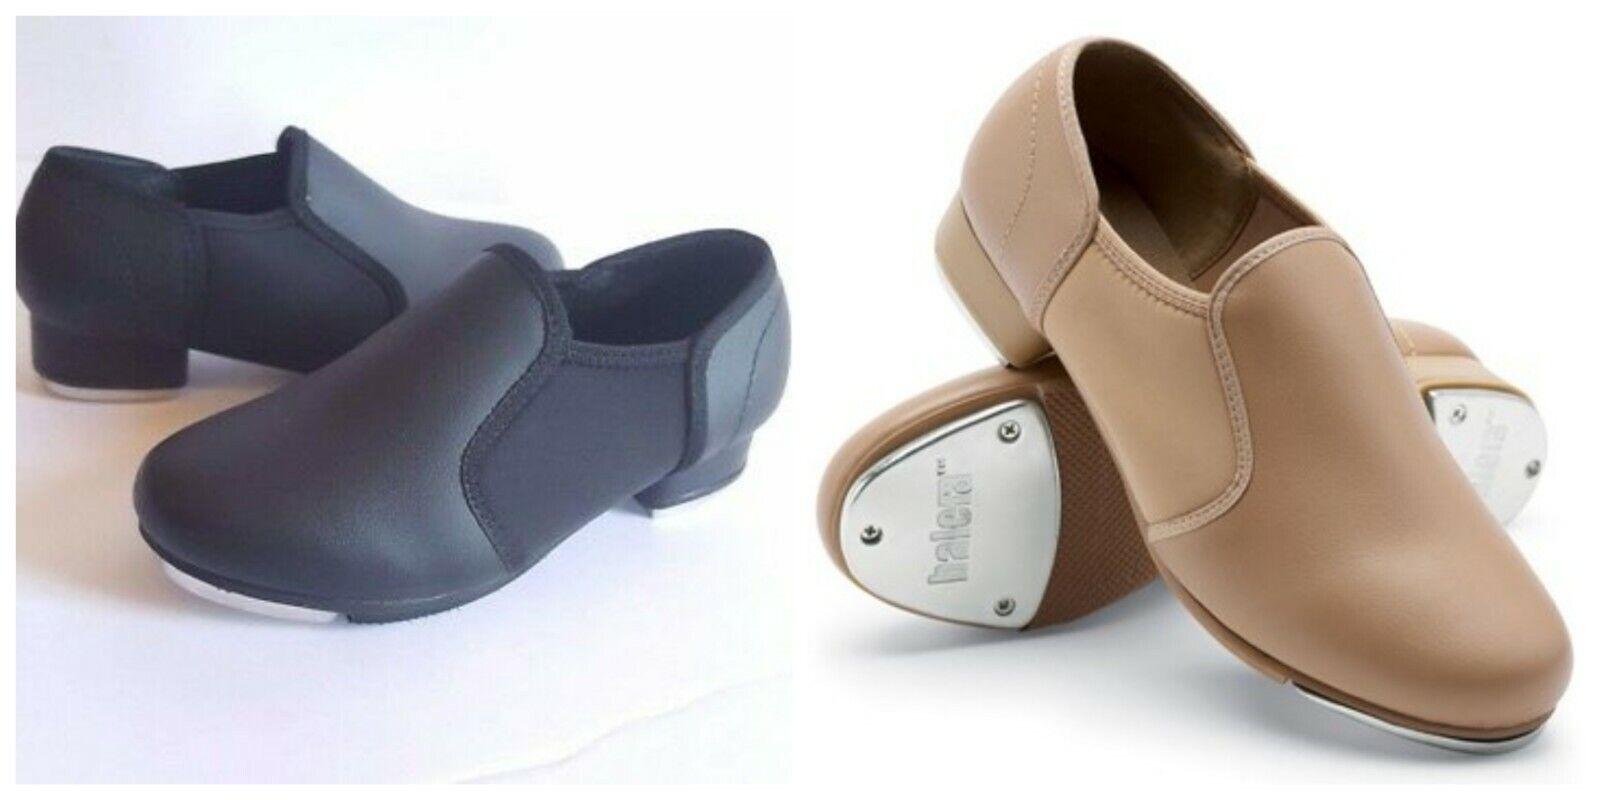 NEW Weissman's Balera Slip on Black and Caramel Tap Shoes Child & Adult Size